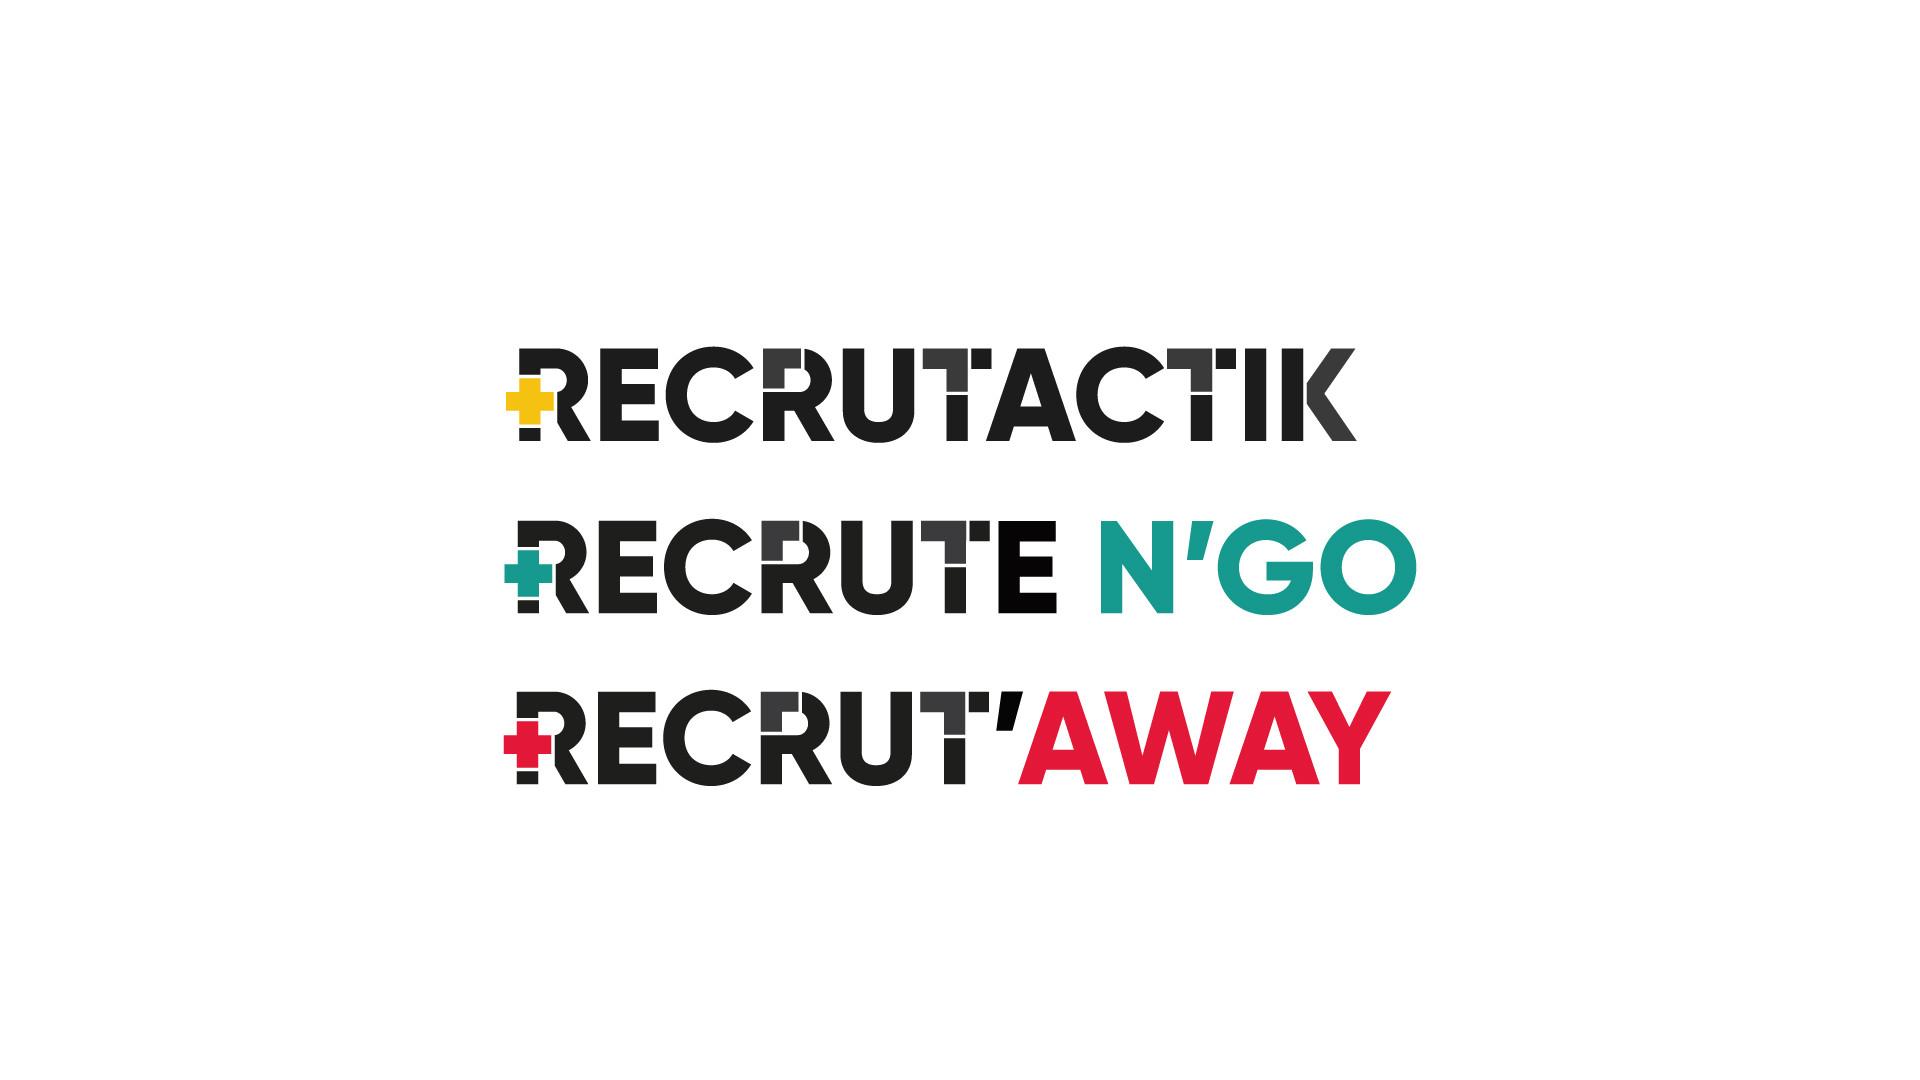 Recrutactik_Plan de travail 1.jpg